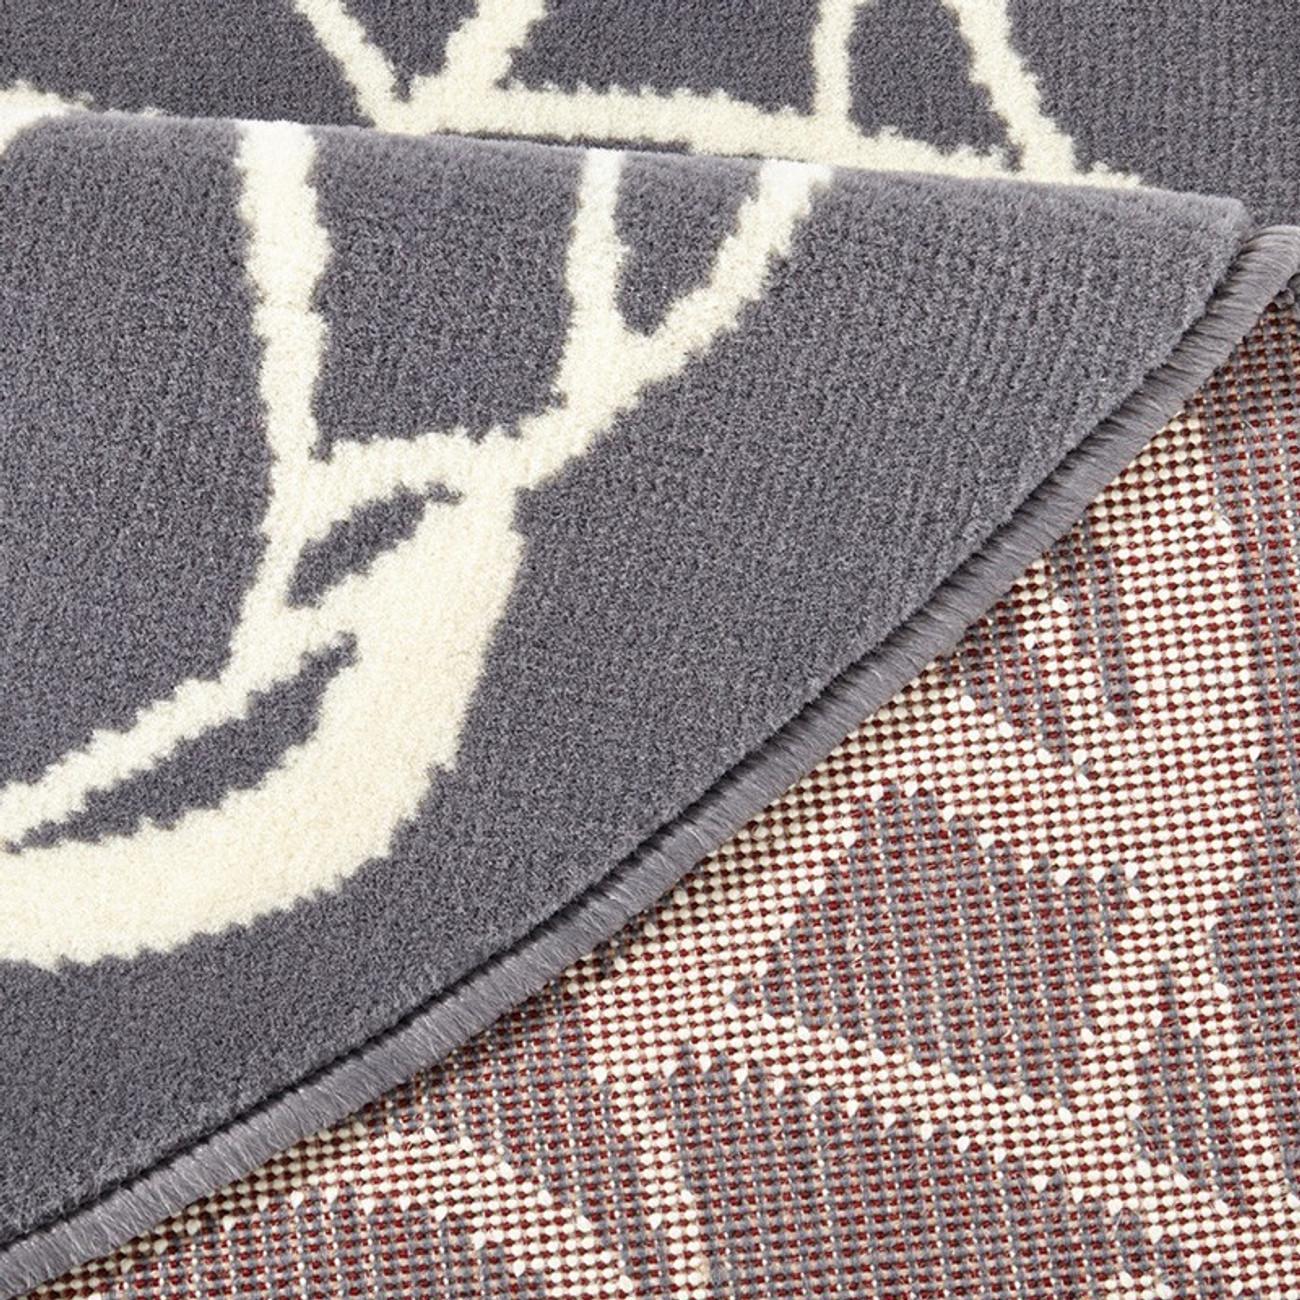 Teppich hellgrau rund  Designer Velours Teppich Mandala Grau Rund 140 cm Teppiche Design ...